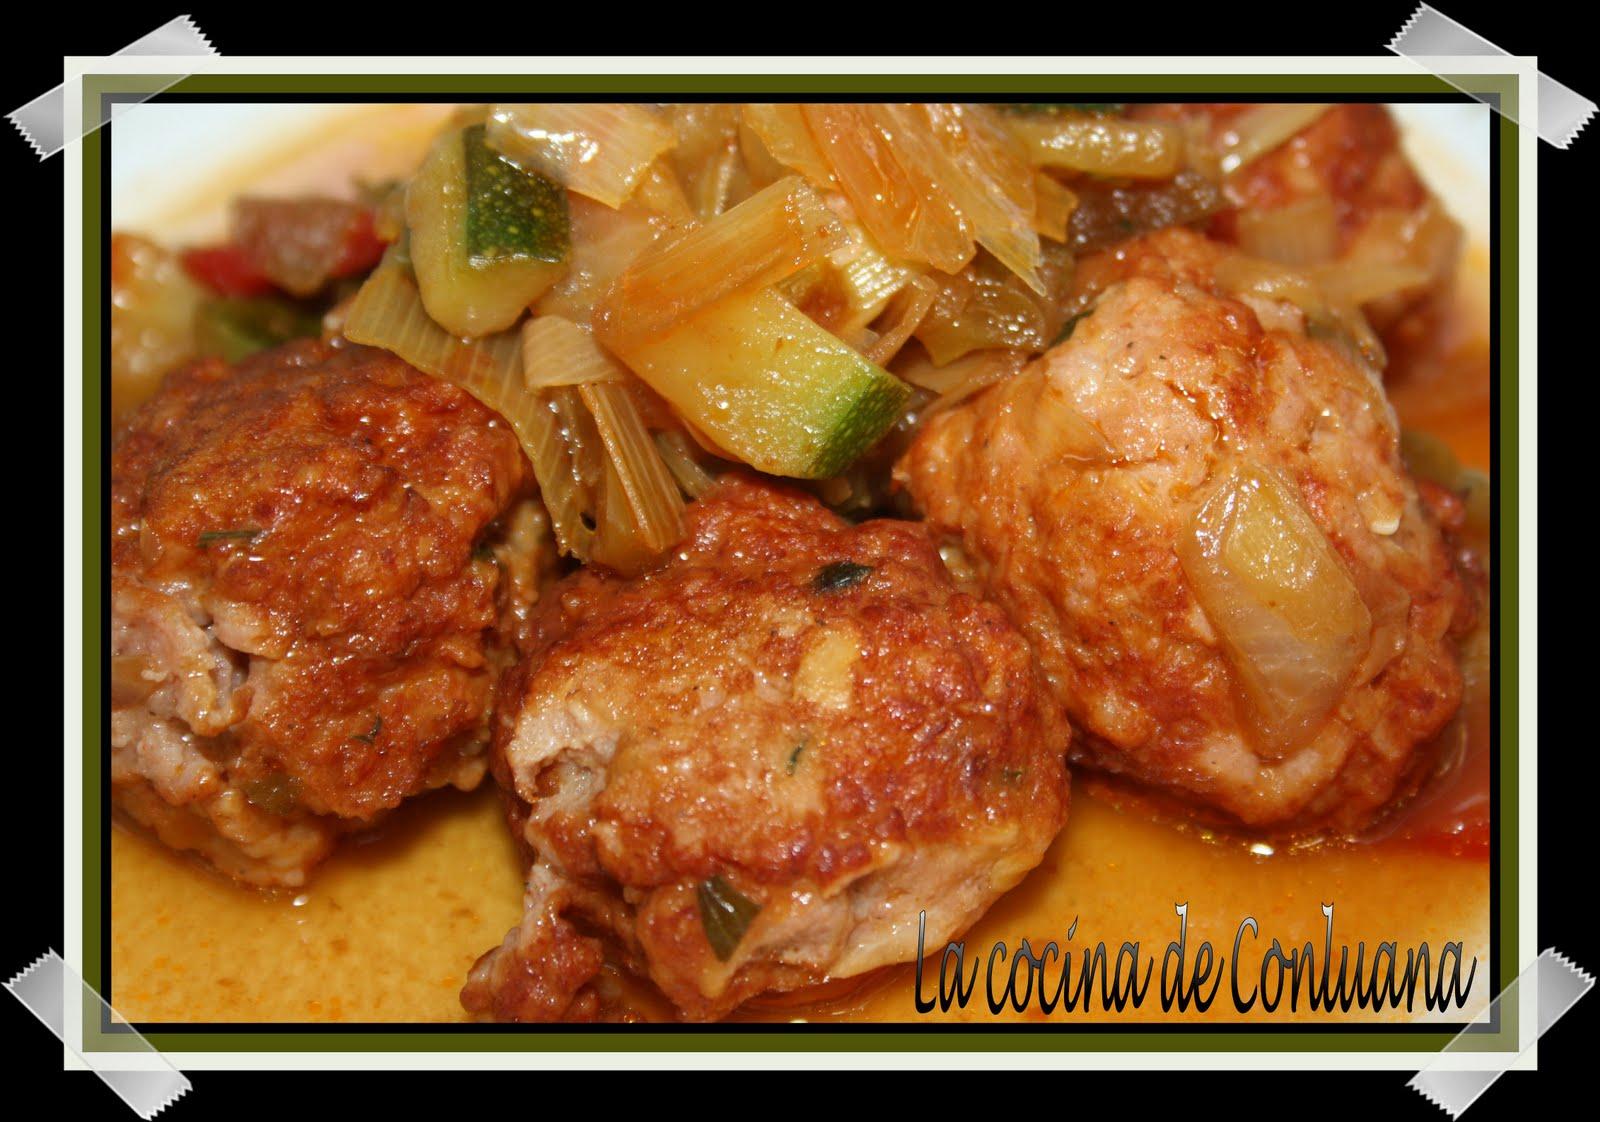 La cocina de conluana alb ndigas de pollo agridulces con for Albondigas de verduras